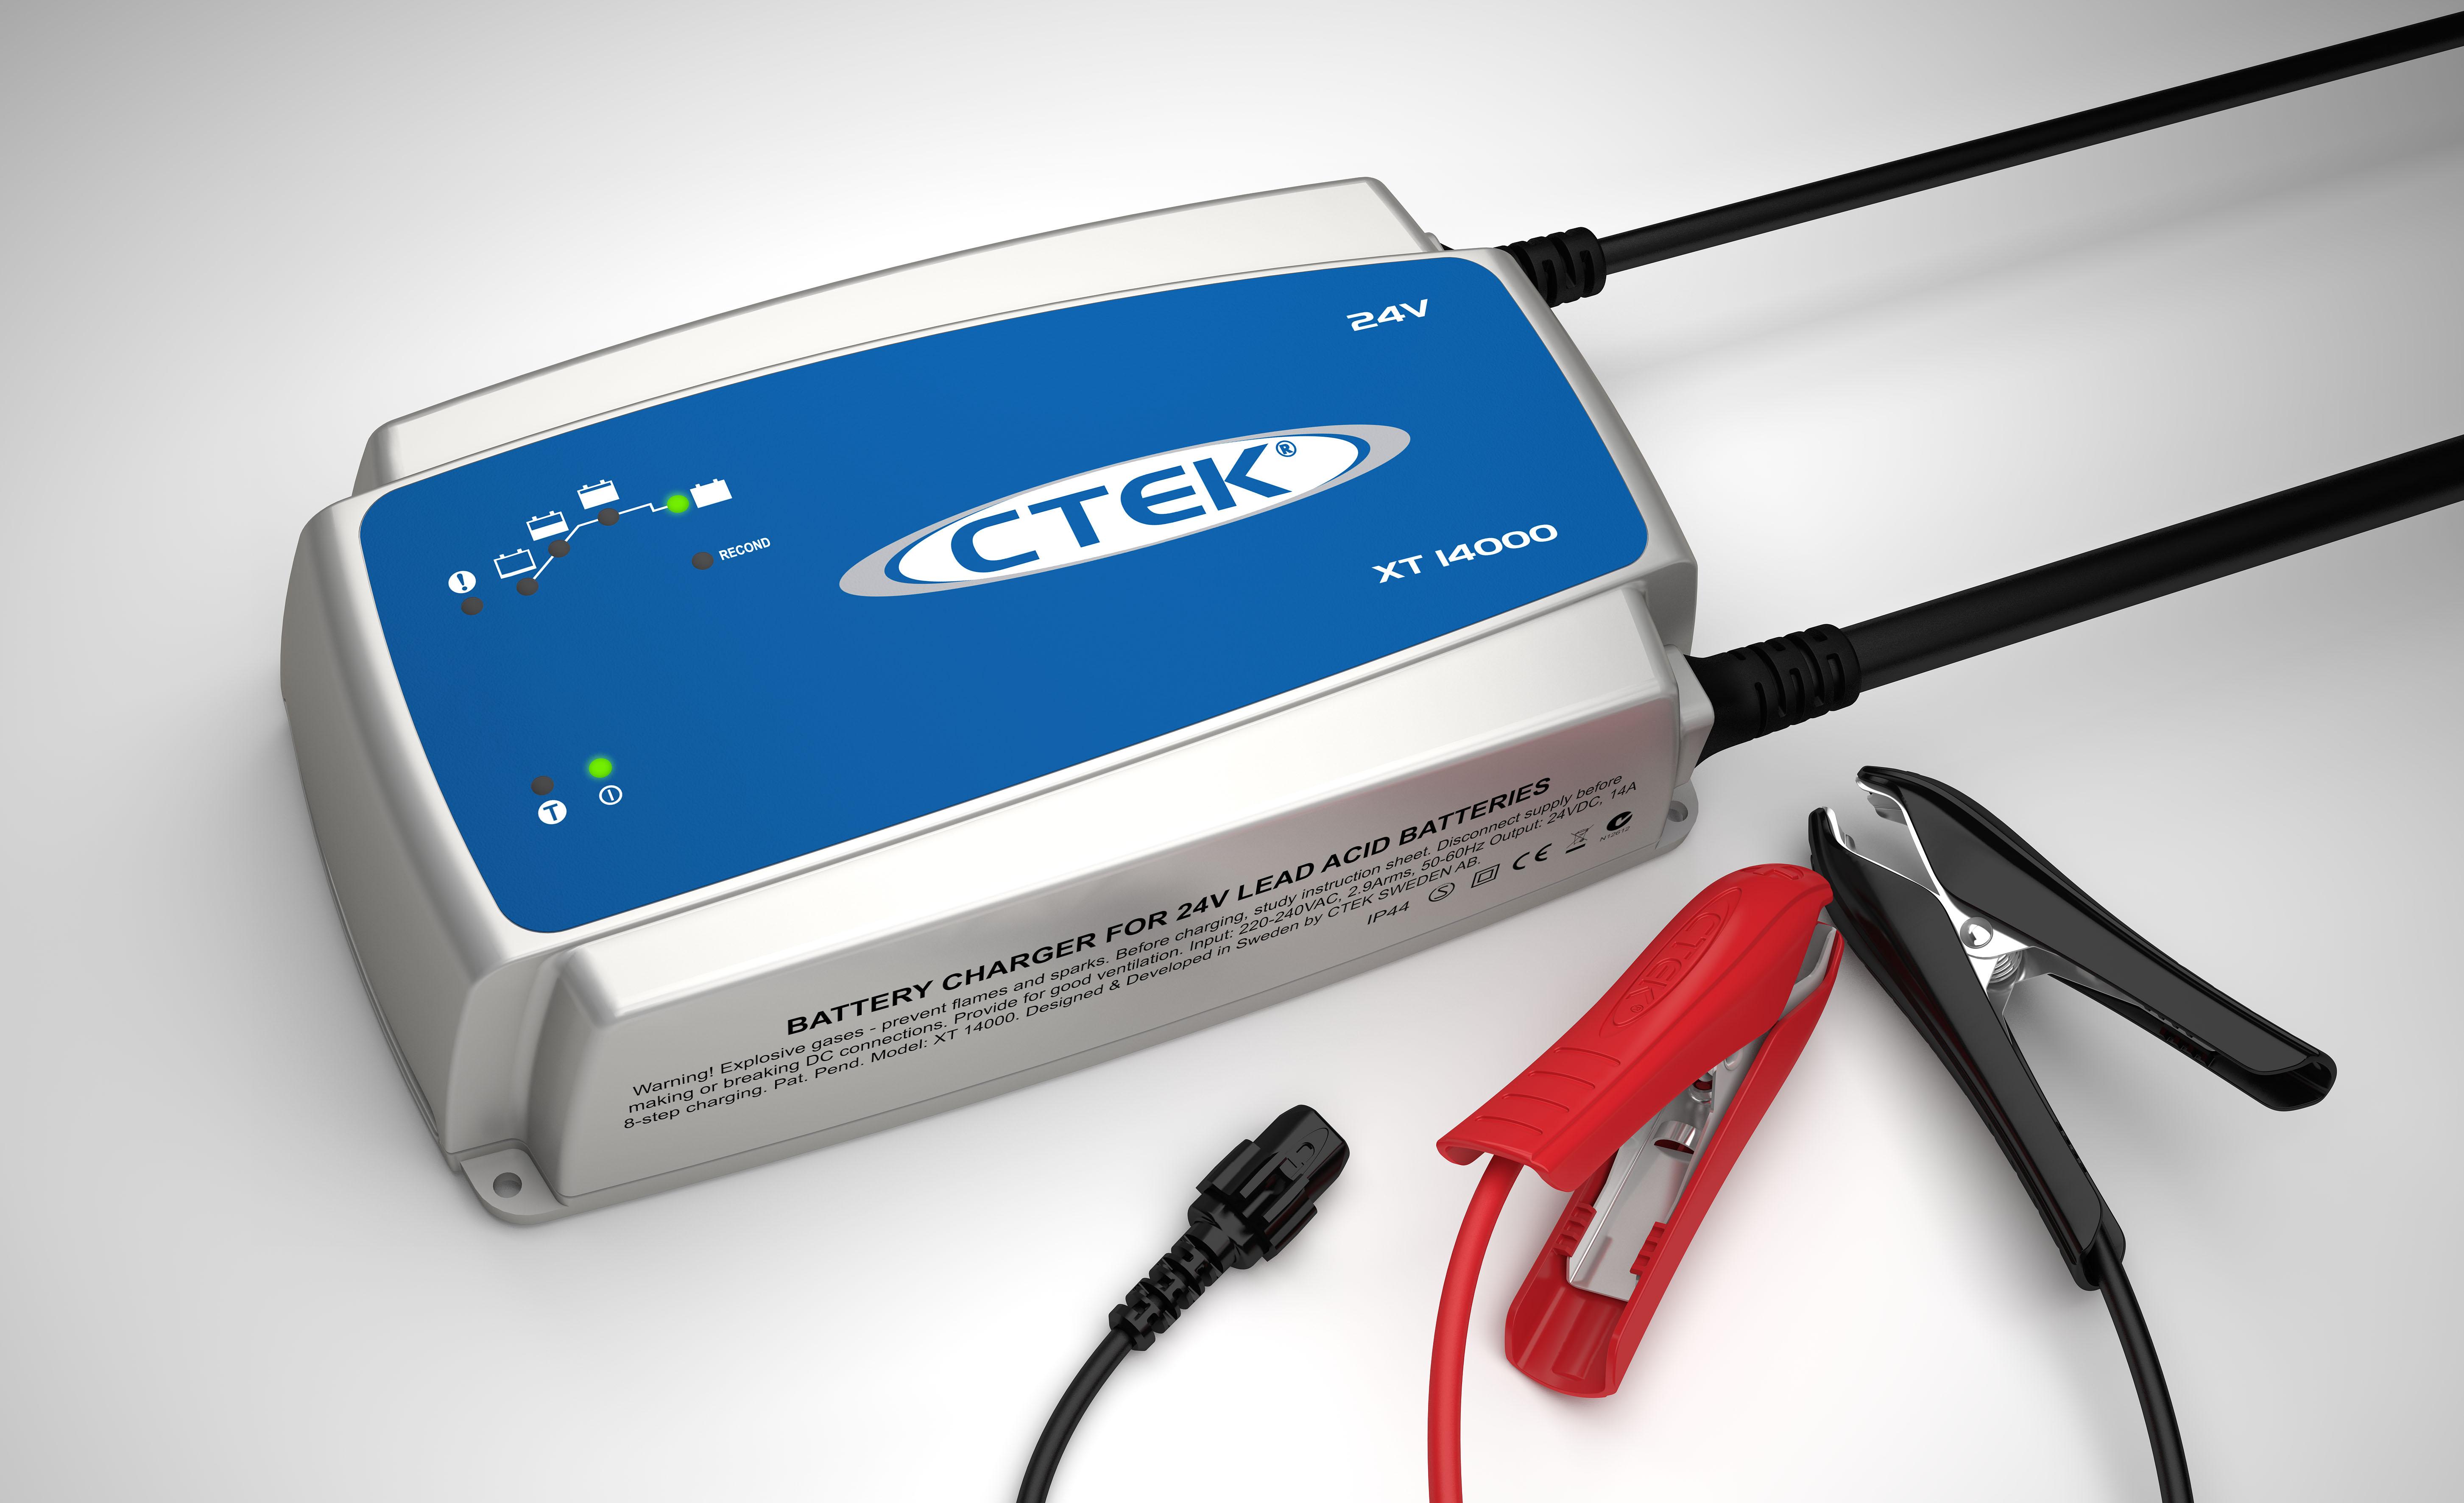 Batteriladd XT 14000 EXT - 24 volt